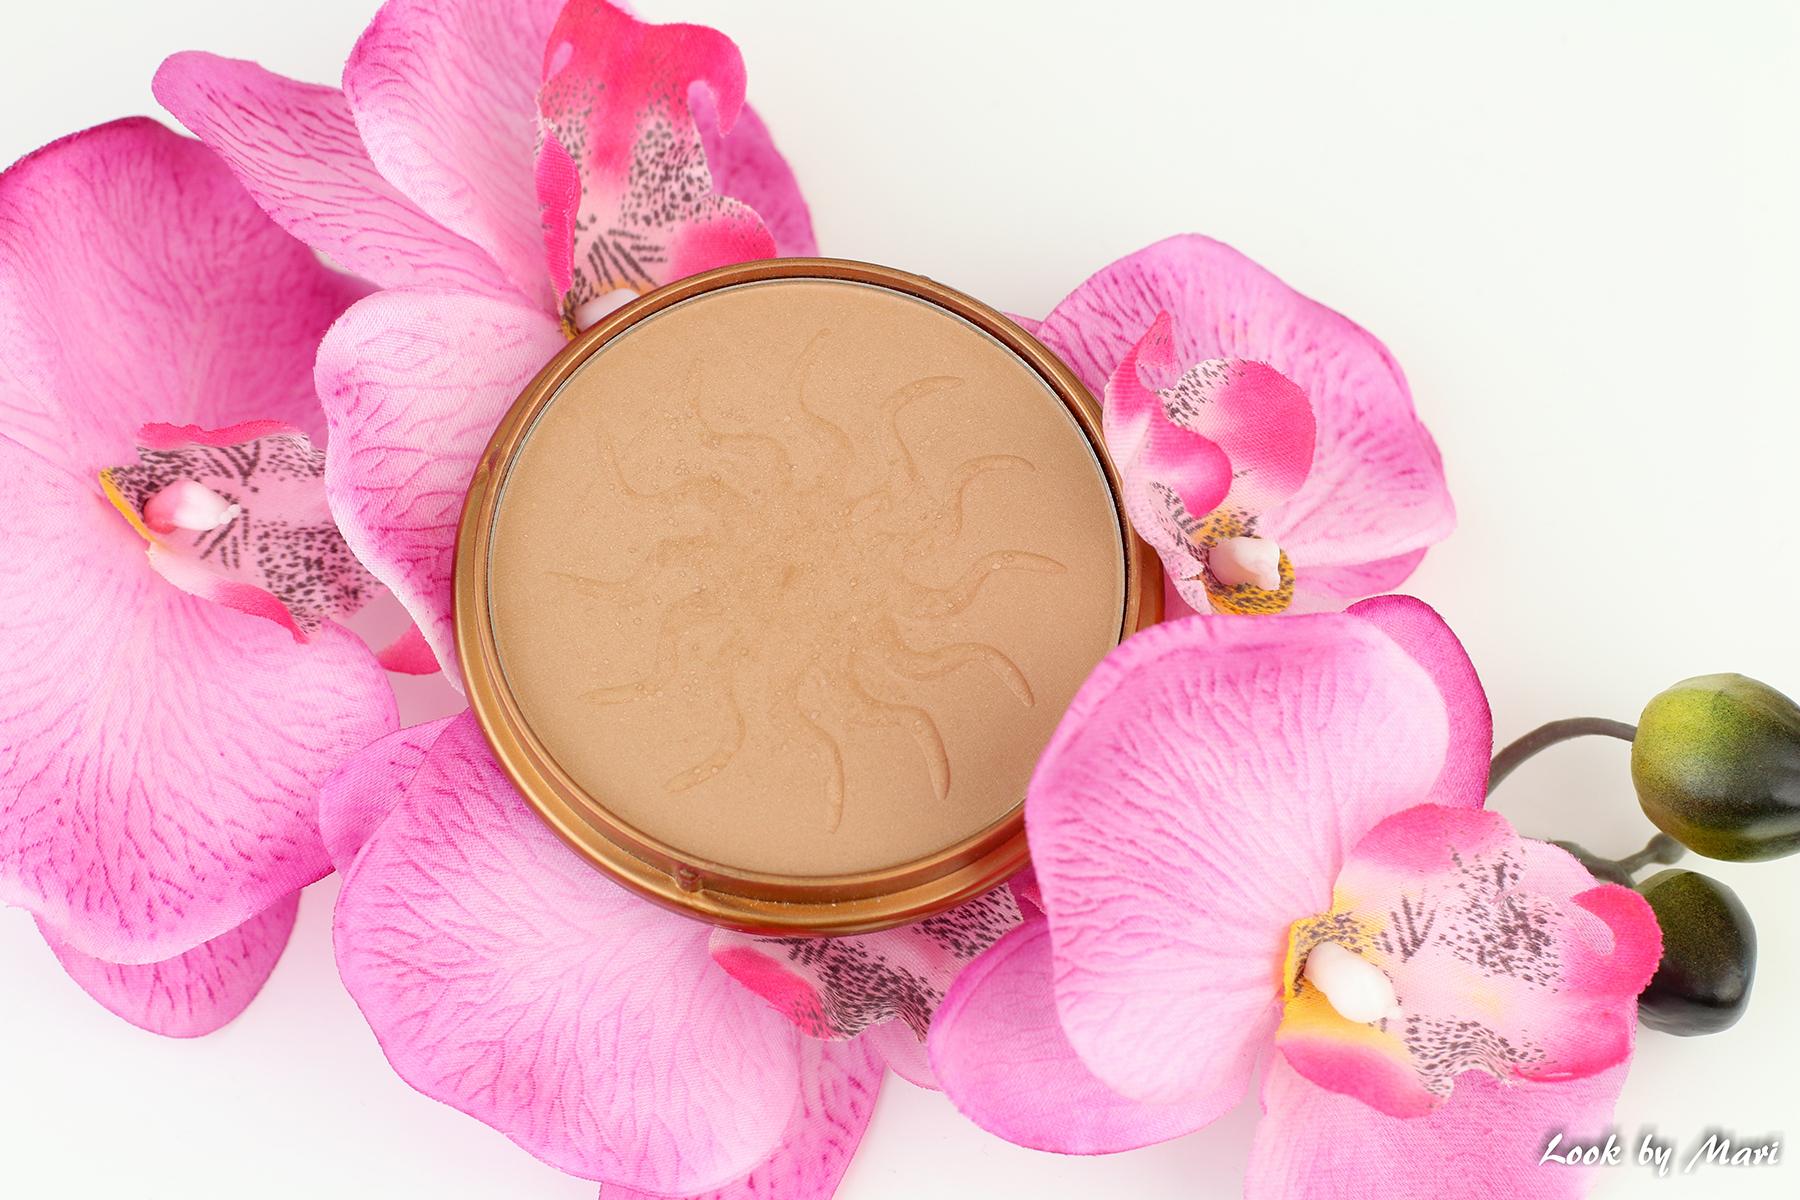 2 rimmel natural bronze waterproof bronzing powder 021 sun light kokemuksia sävy väri